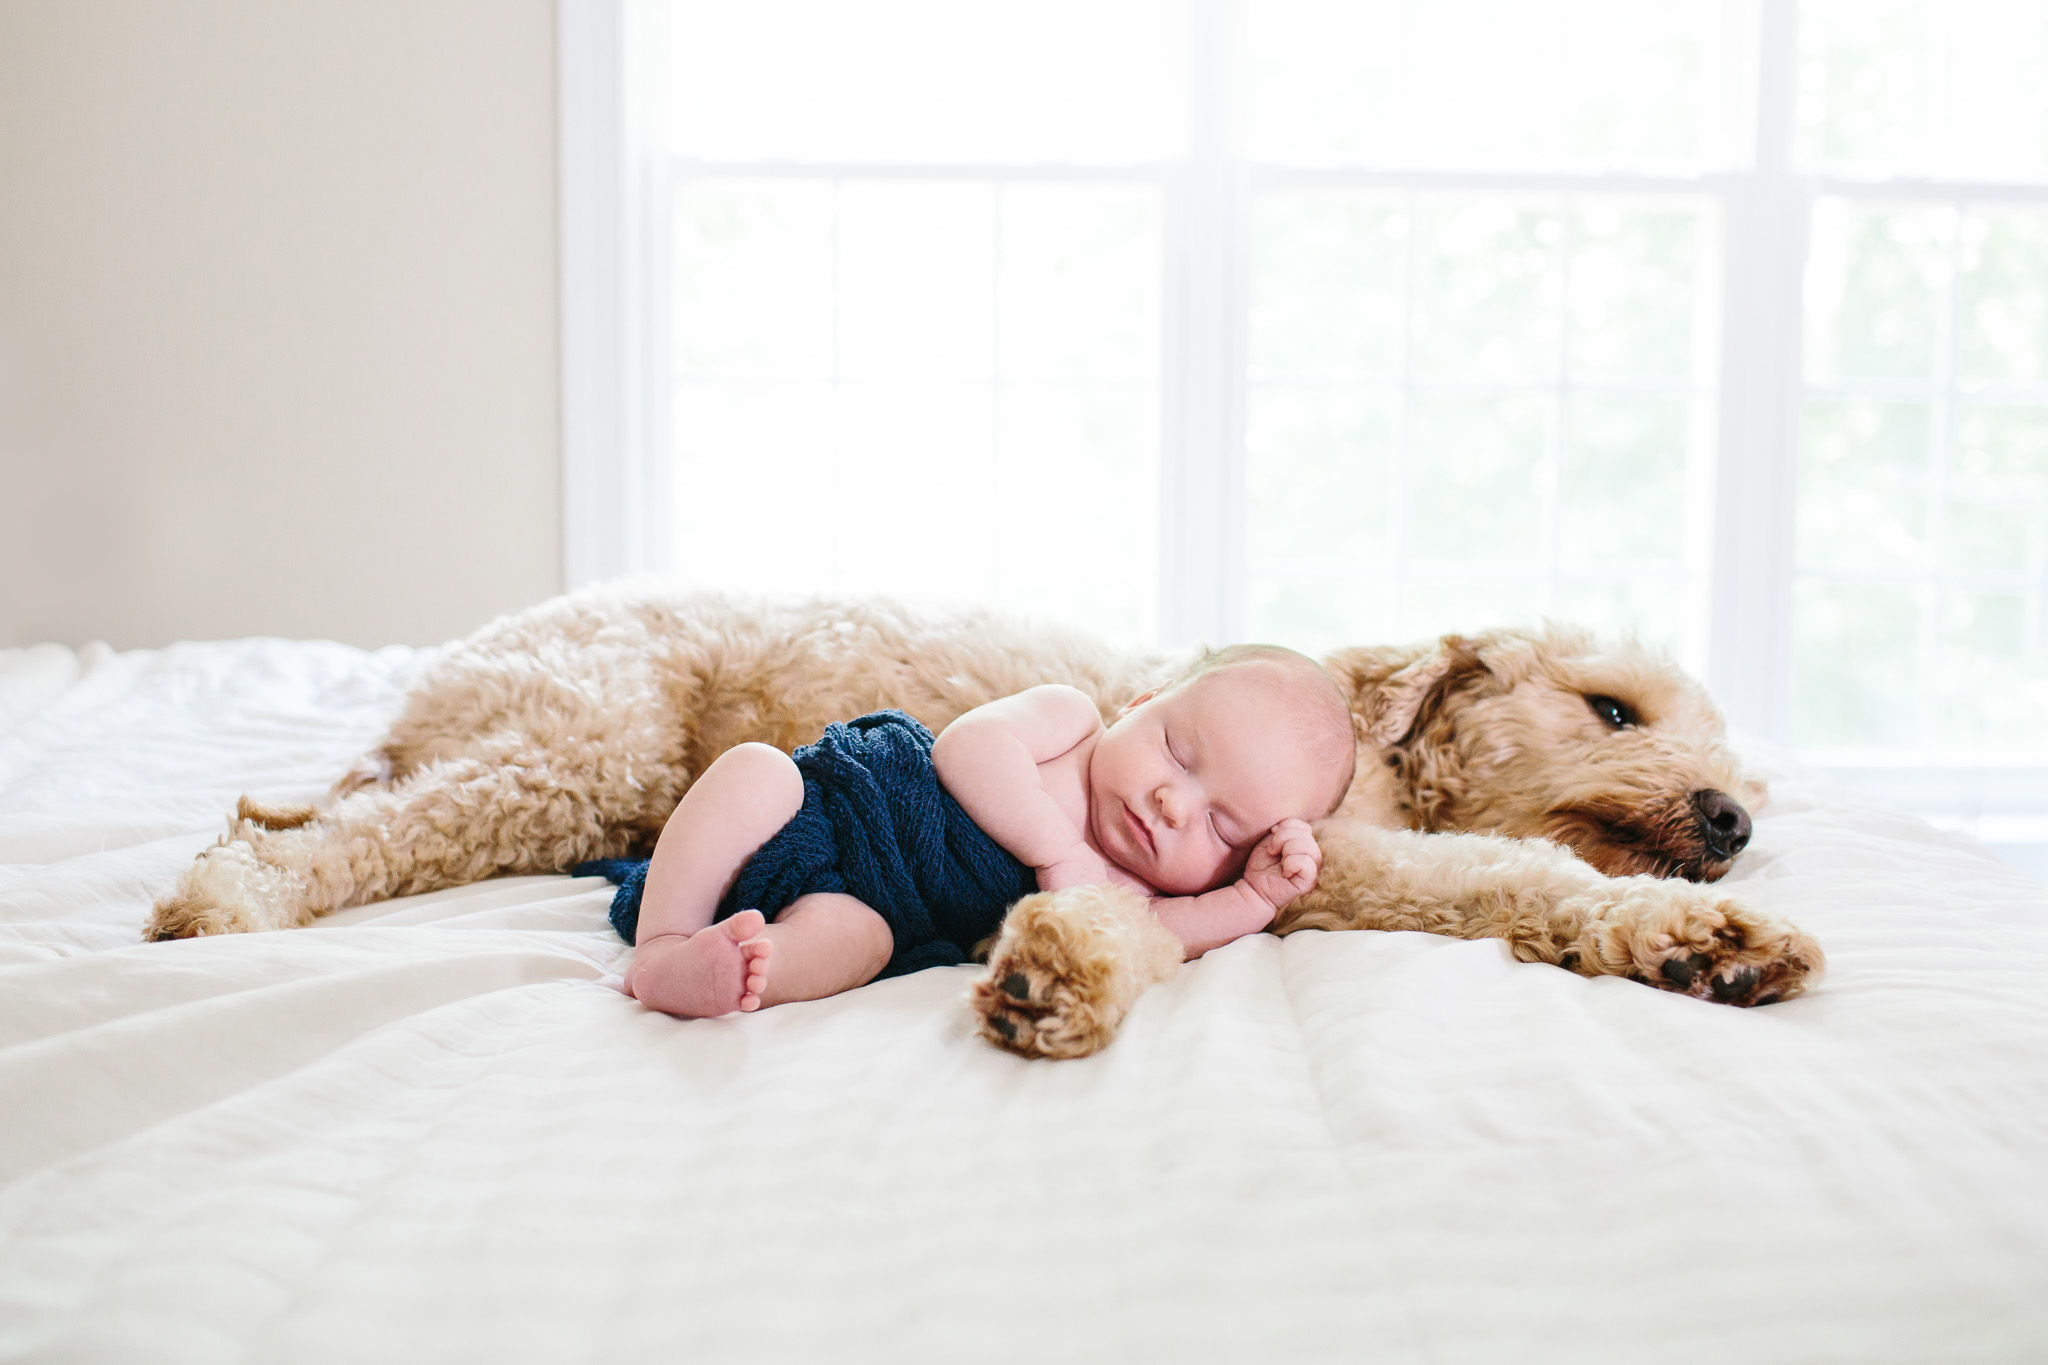 jennichandlerphotography_koden_newborn_WEB-68.jpg